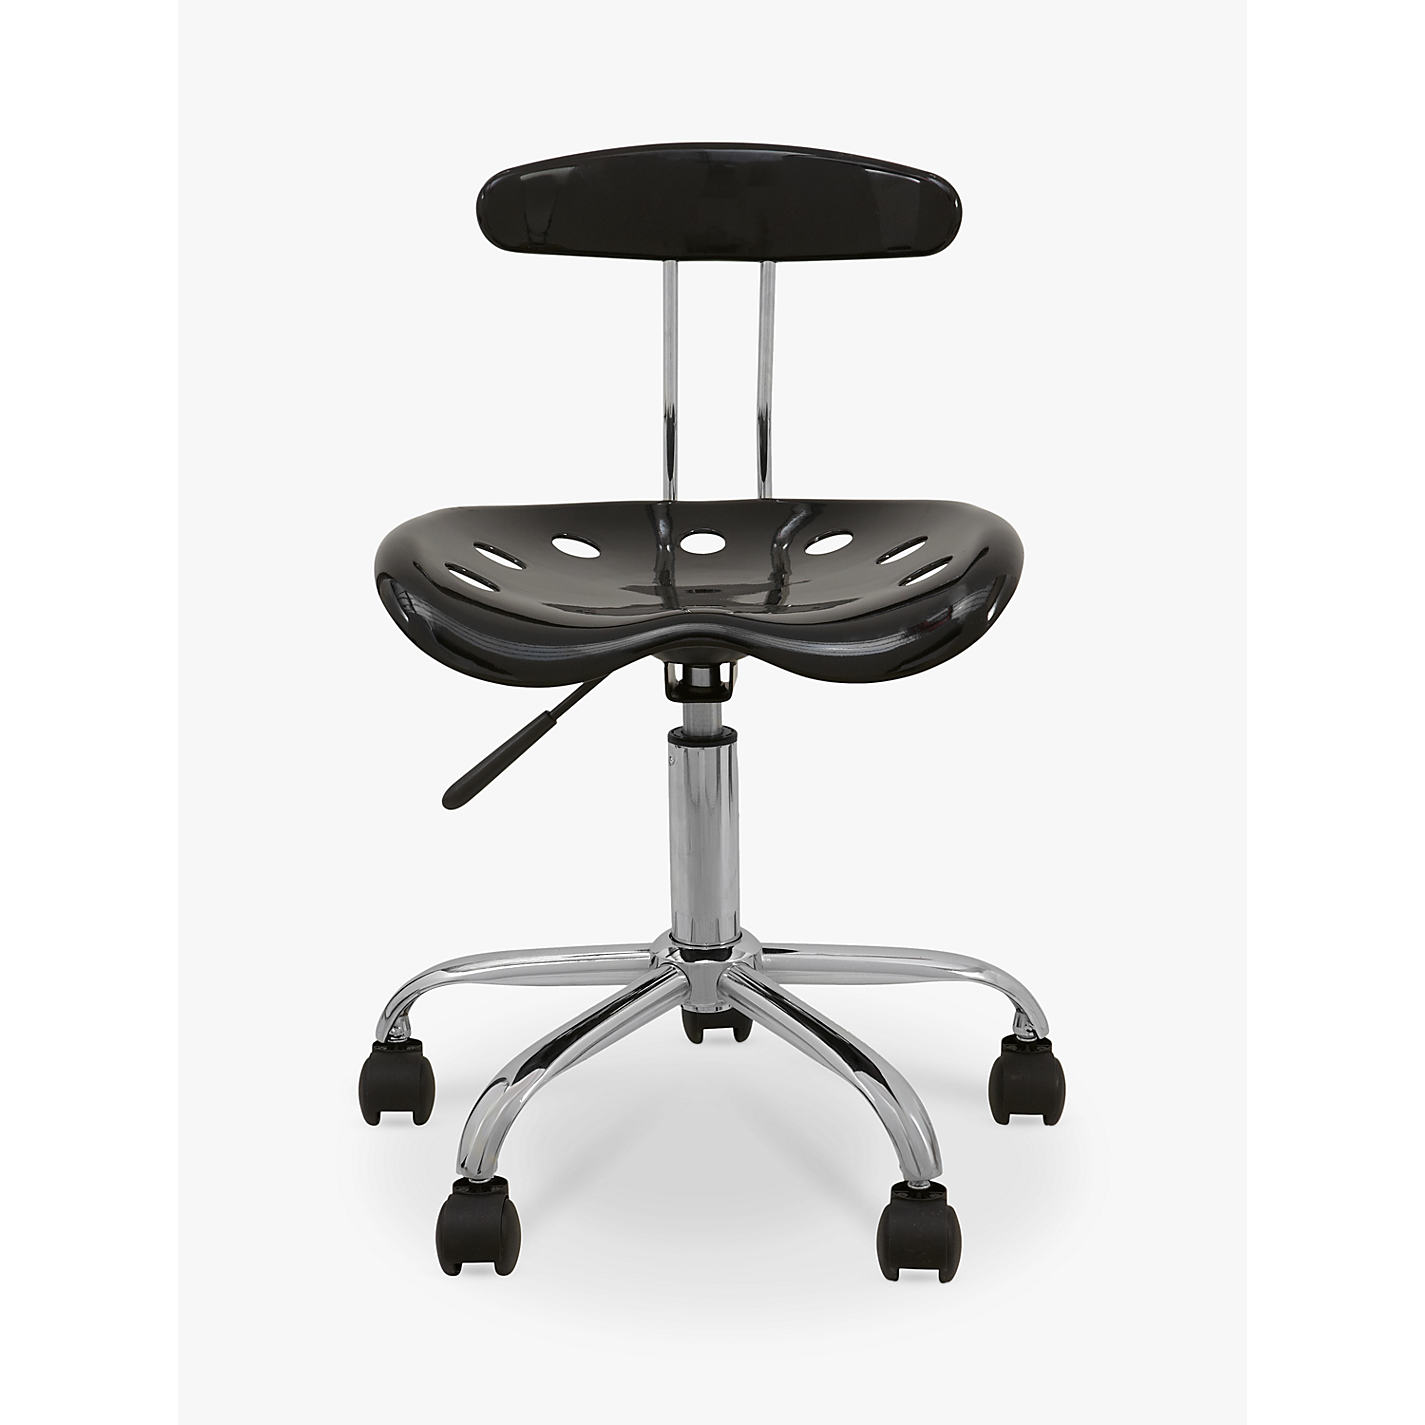 Buy John Lewis The Basics Giles Office Chair | John Lewis